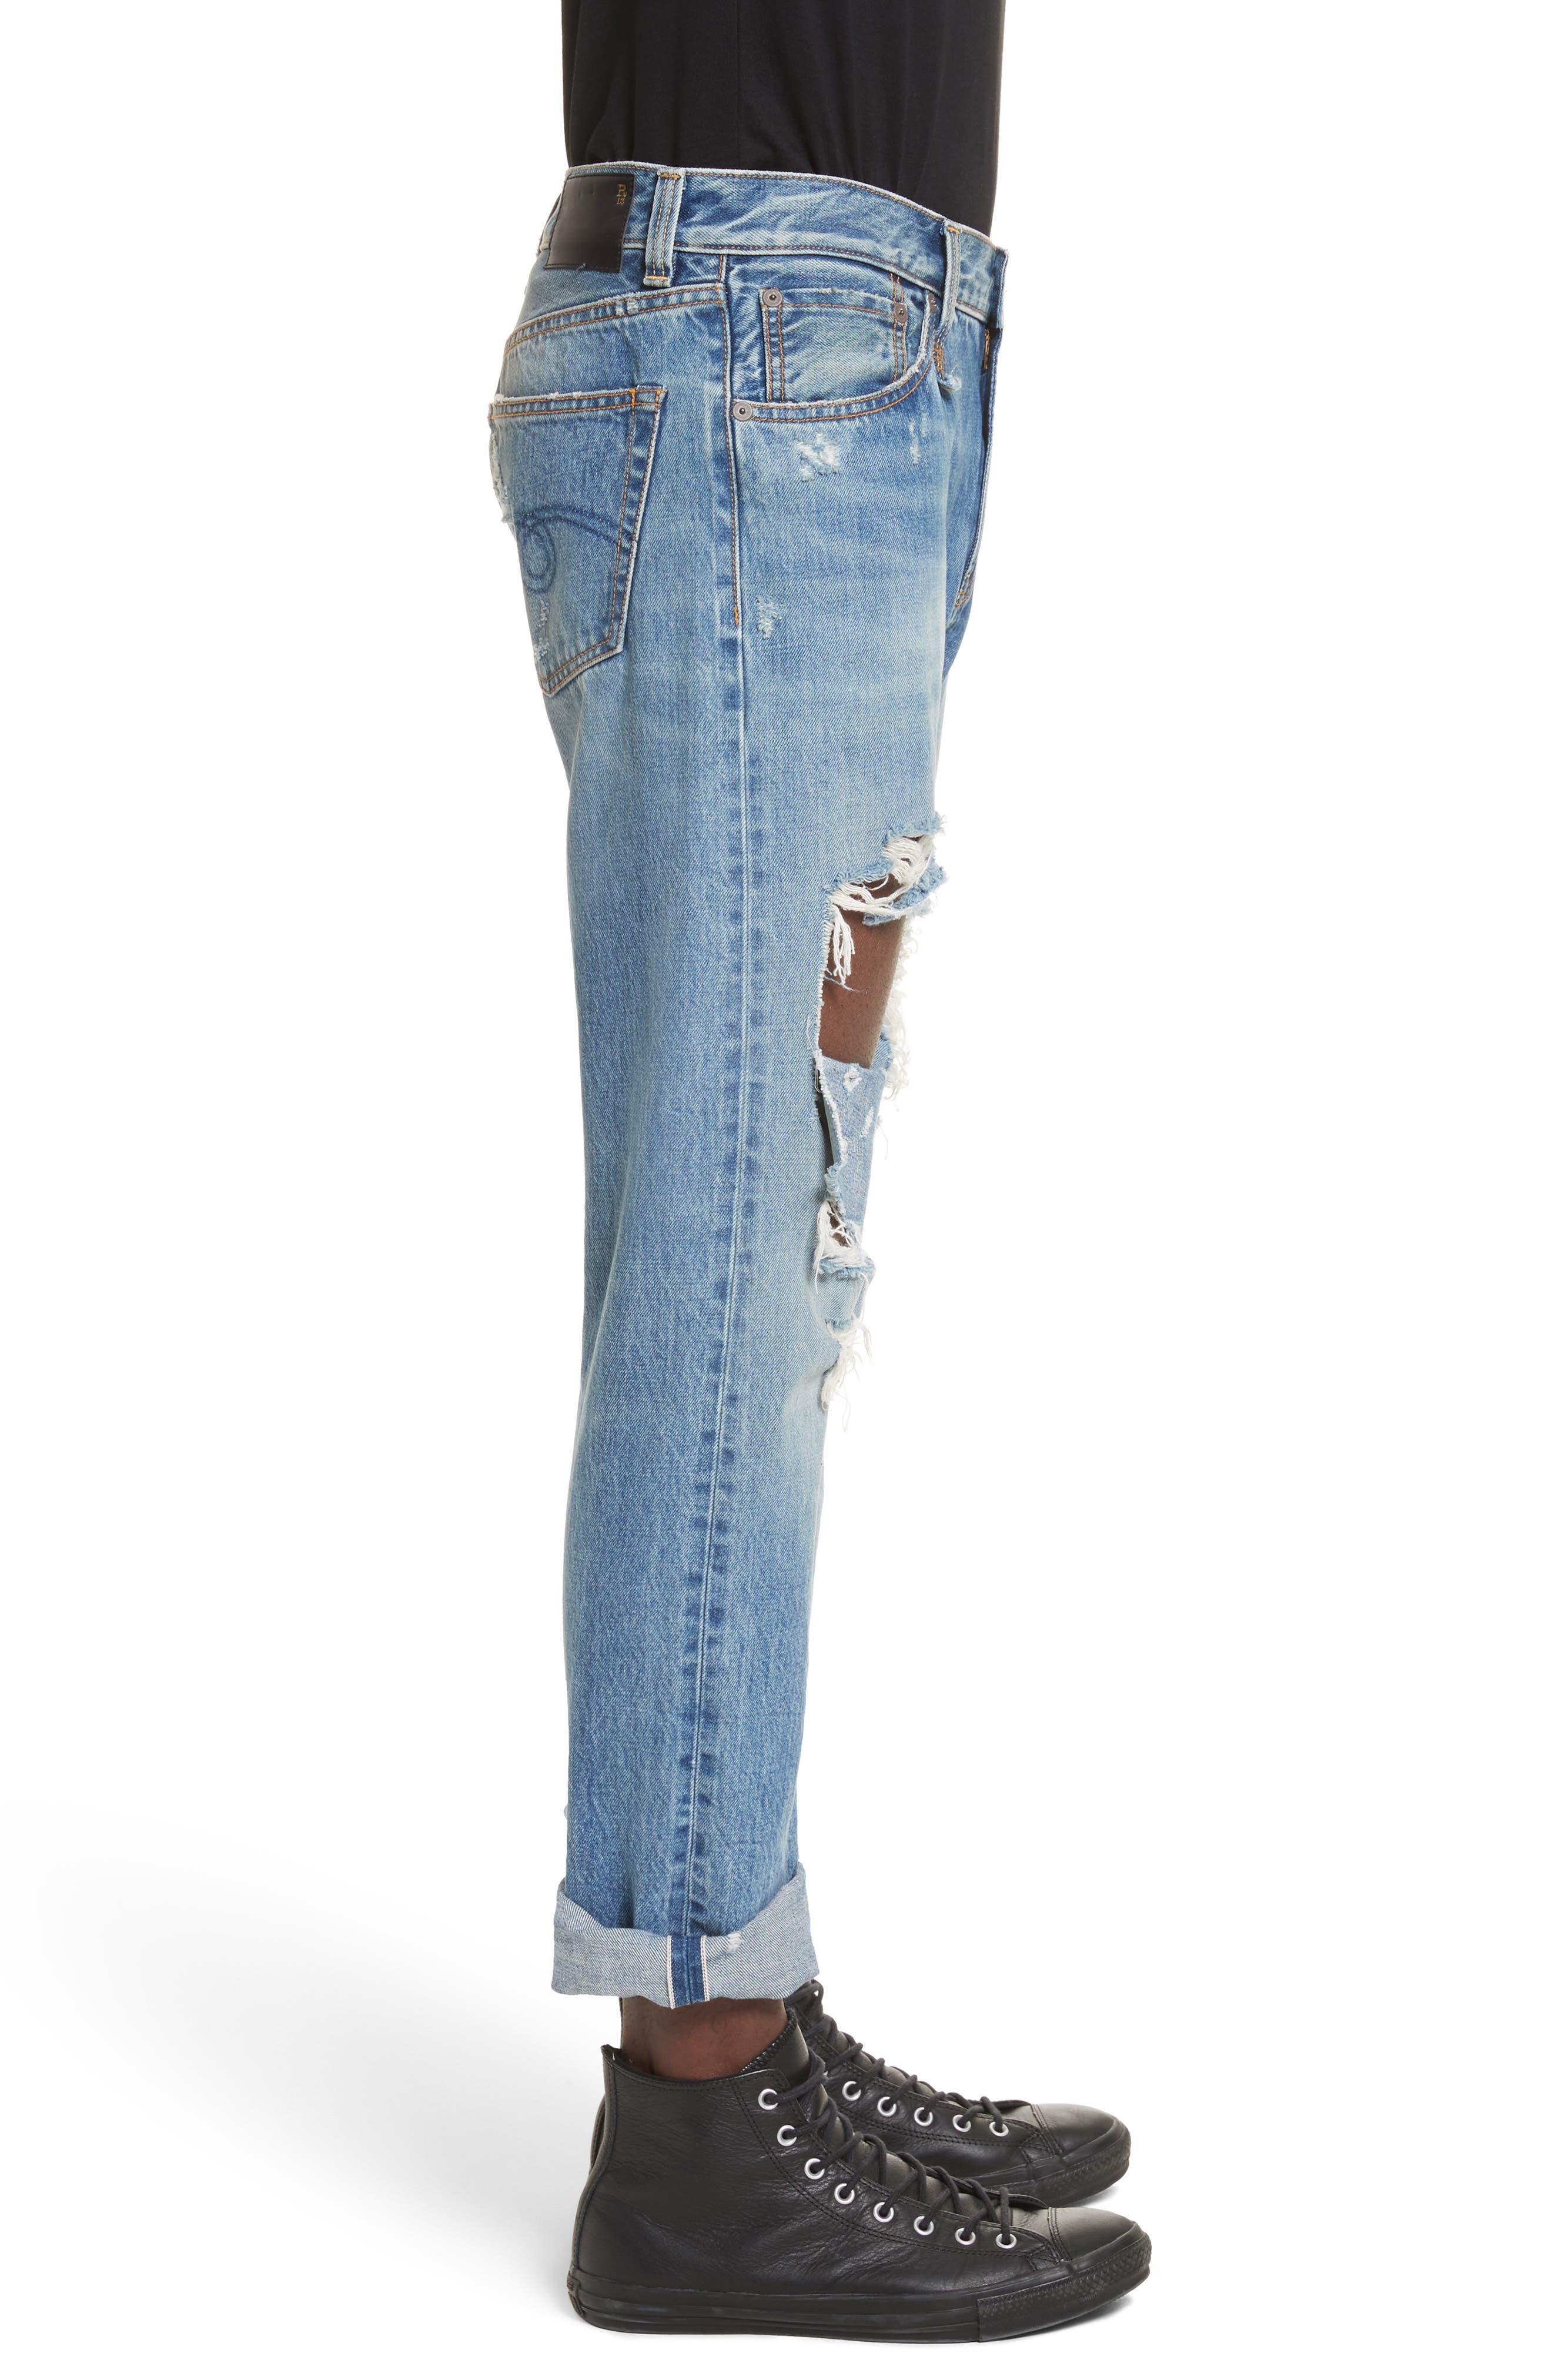 Sid Distressed Cutoff Straight Leg Jeans,                             Alternate thumbnail 3, color,                             Jasper Selvege W Rips